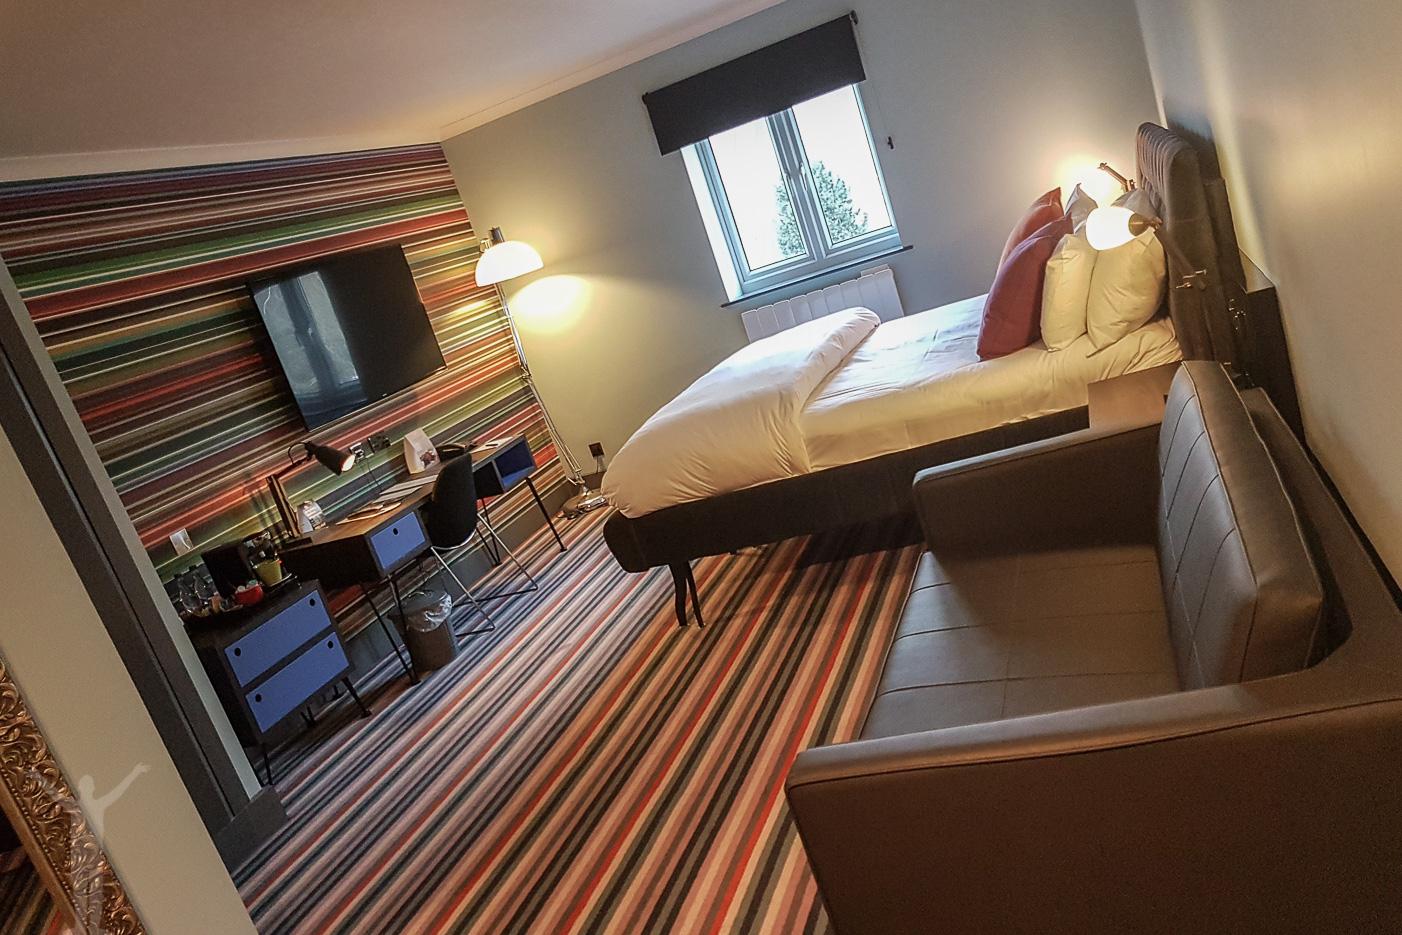 Village Hotel, Cardiff